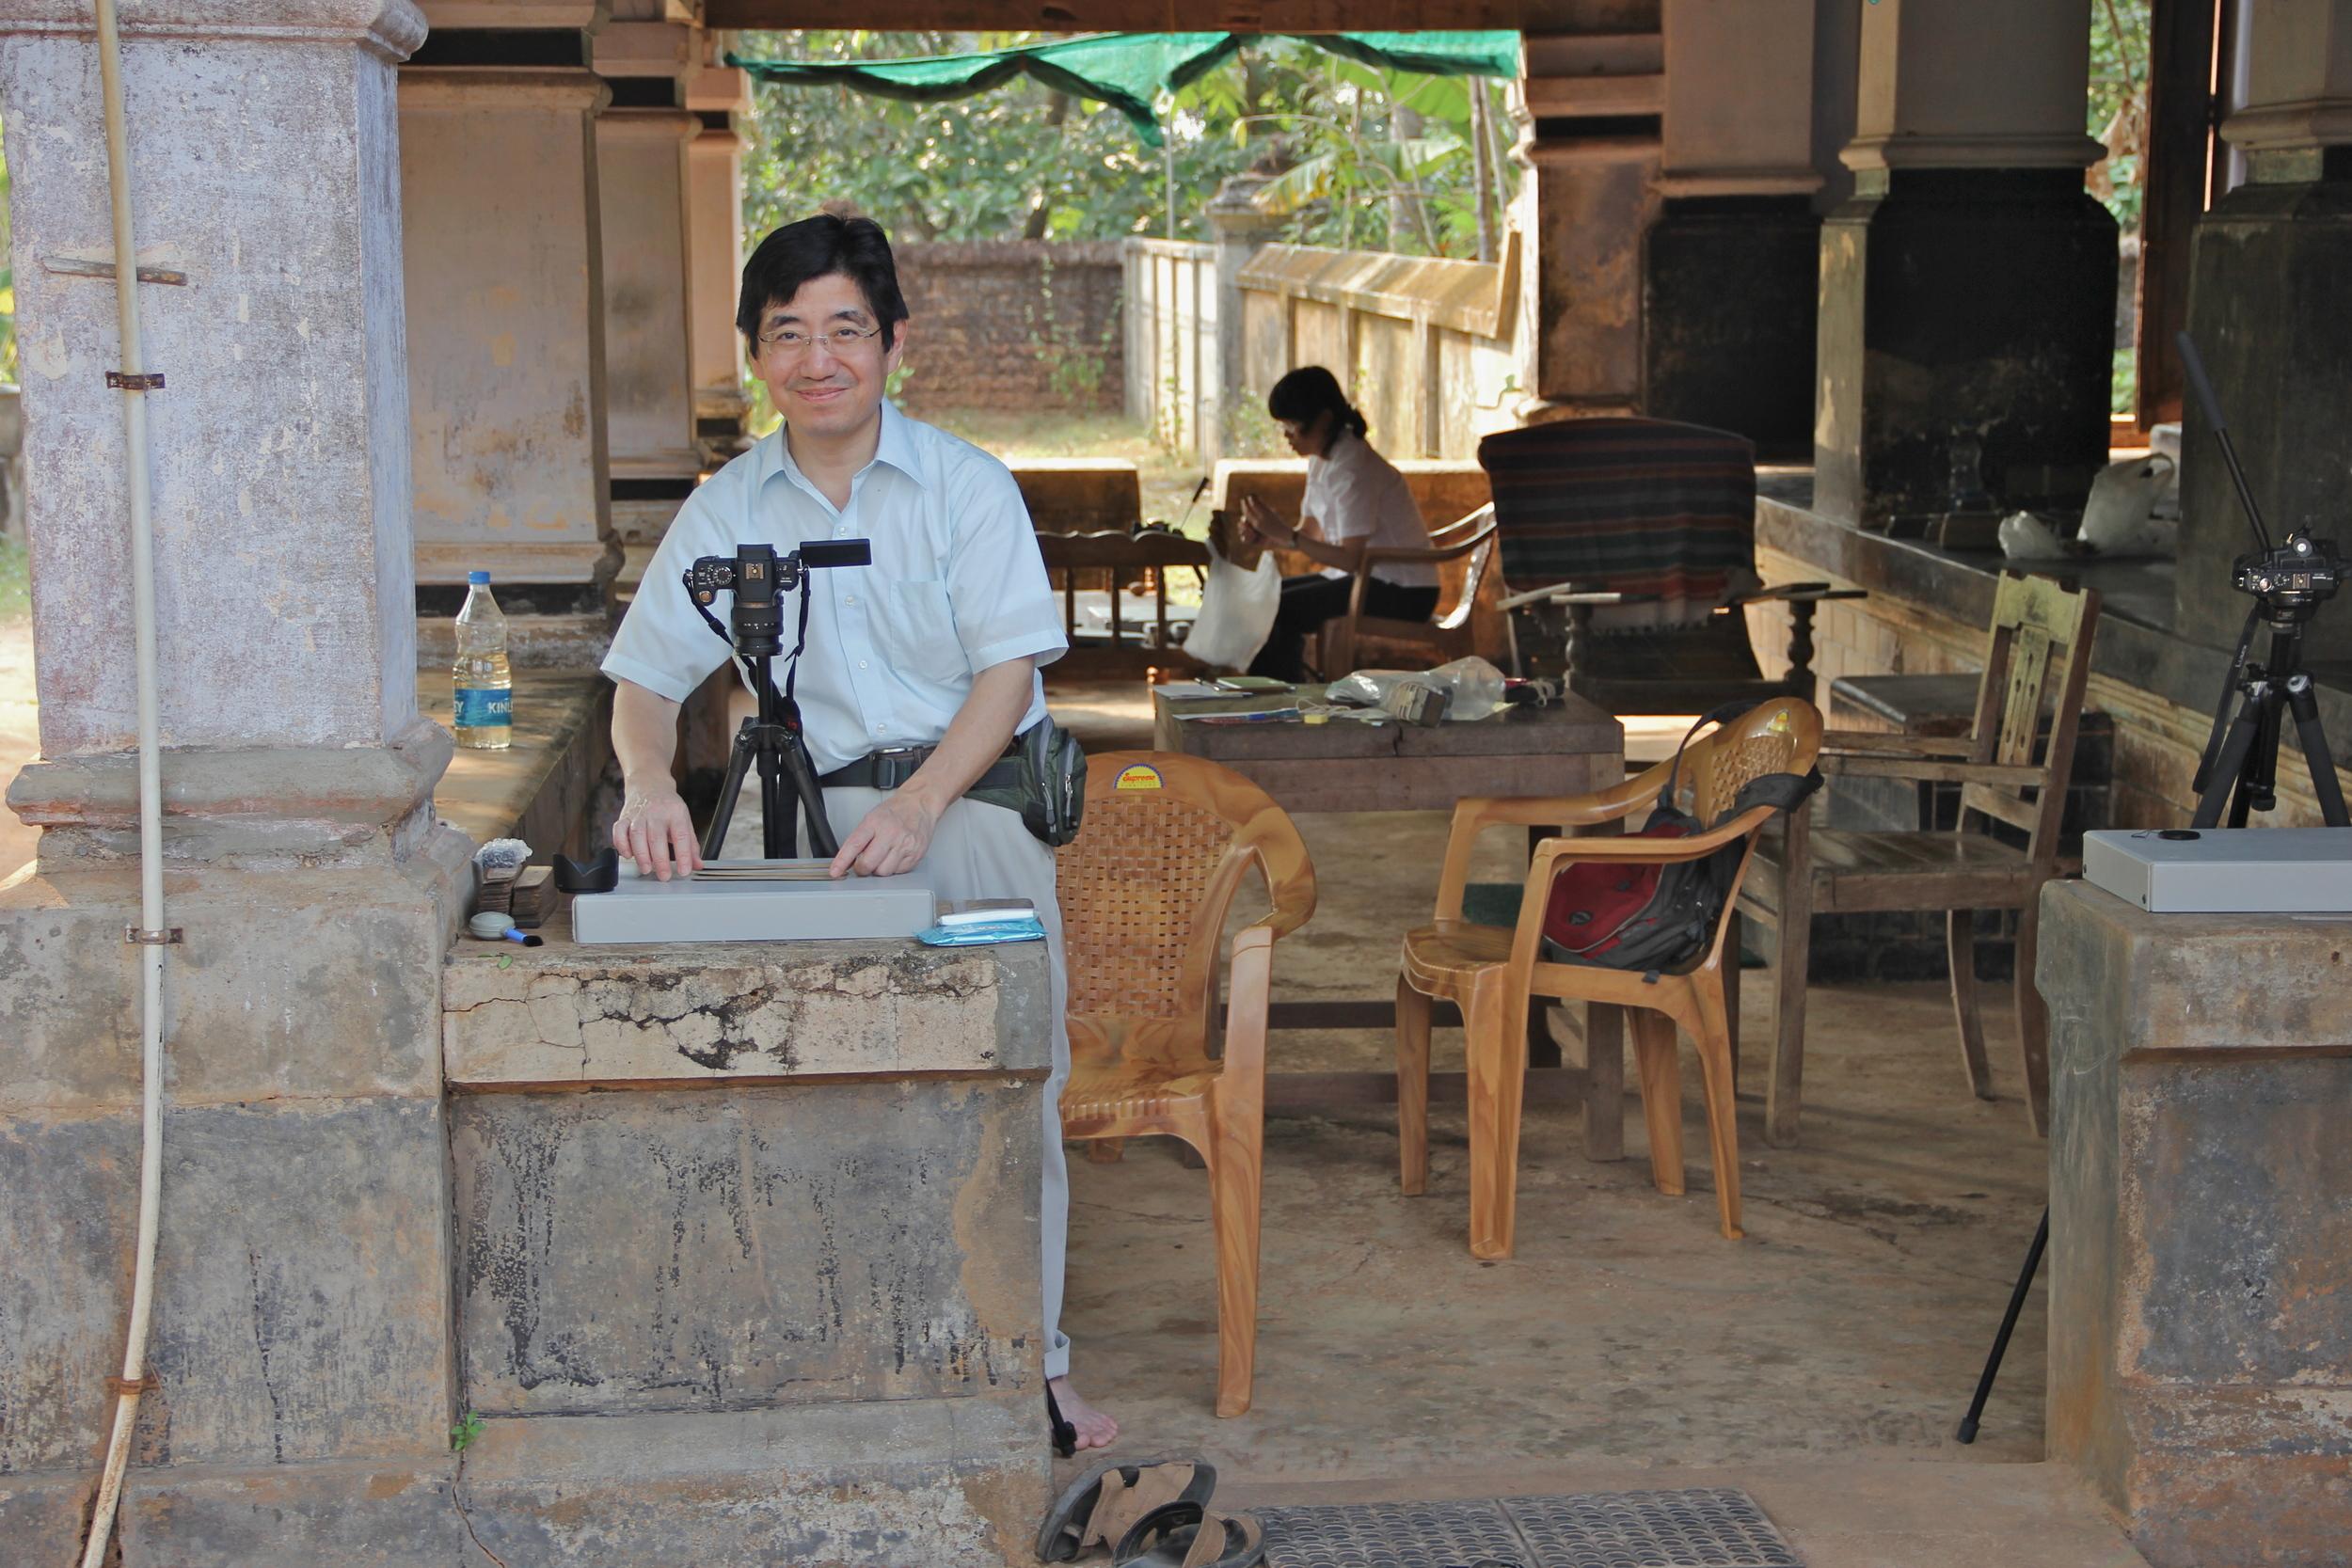 Masato Fujii (with Mieko Kajihara in back) photographing manuscripts near Irinjalakuda, Kerala.